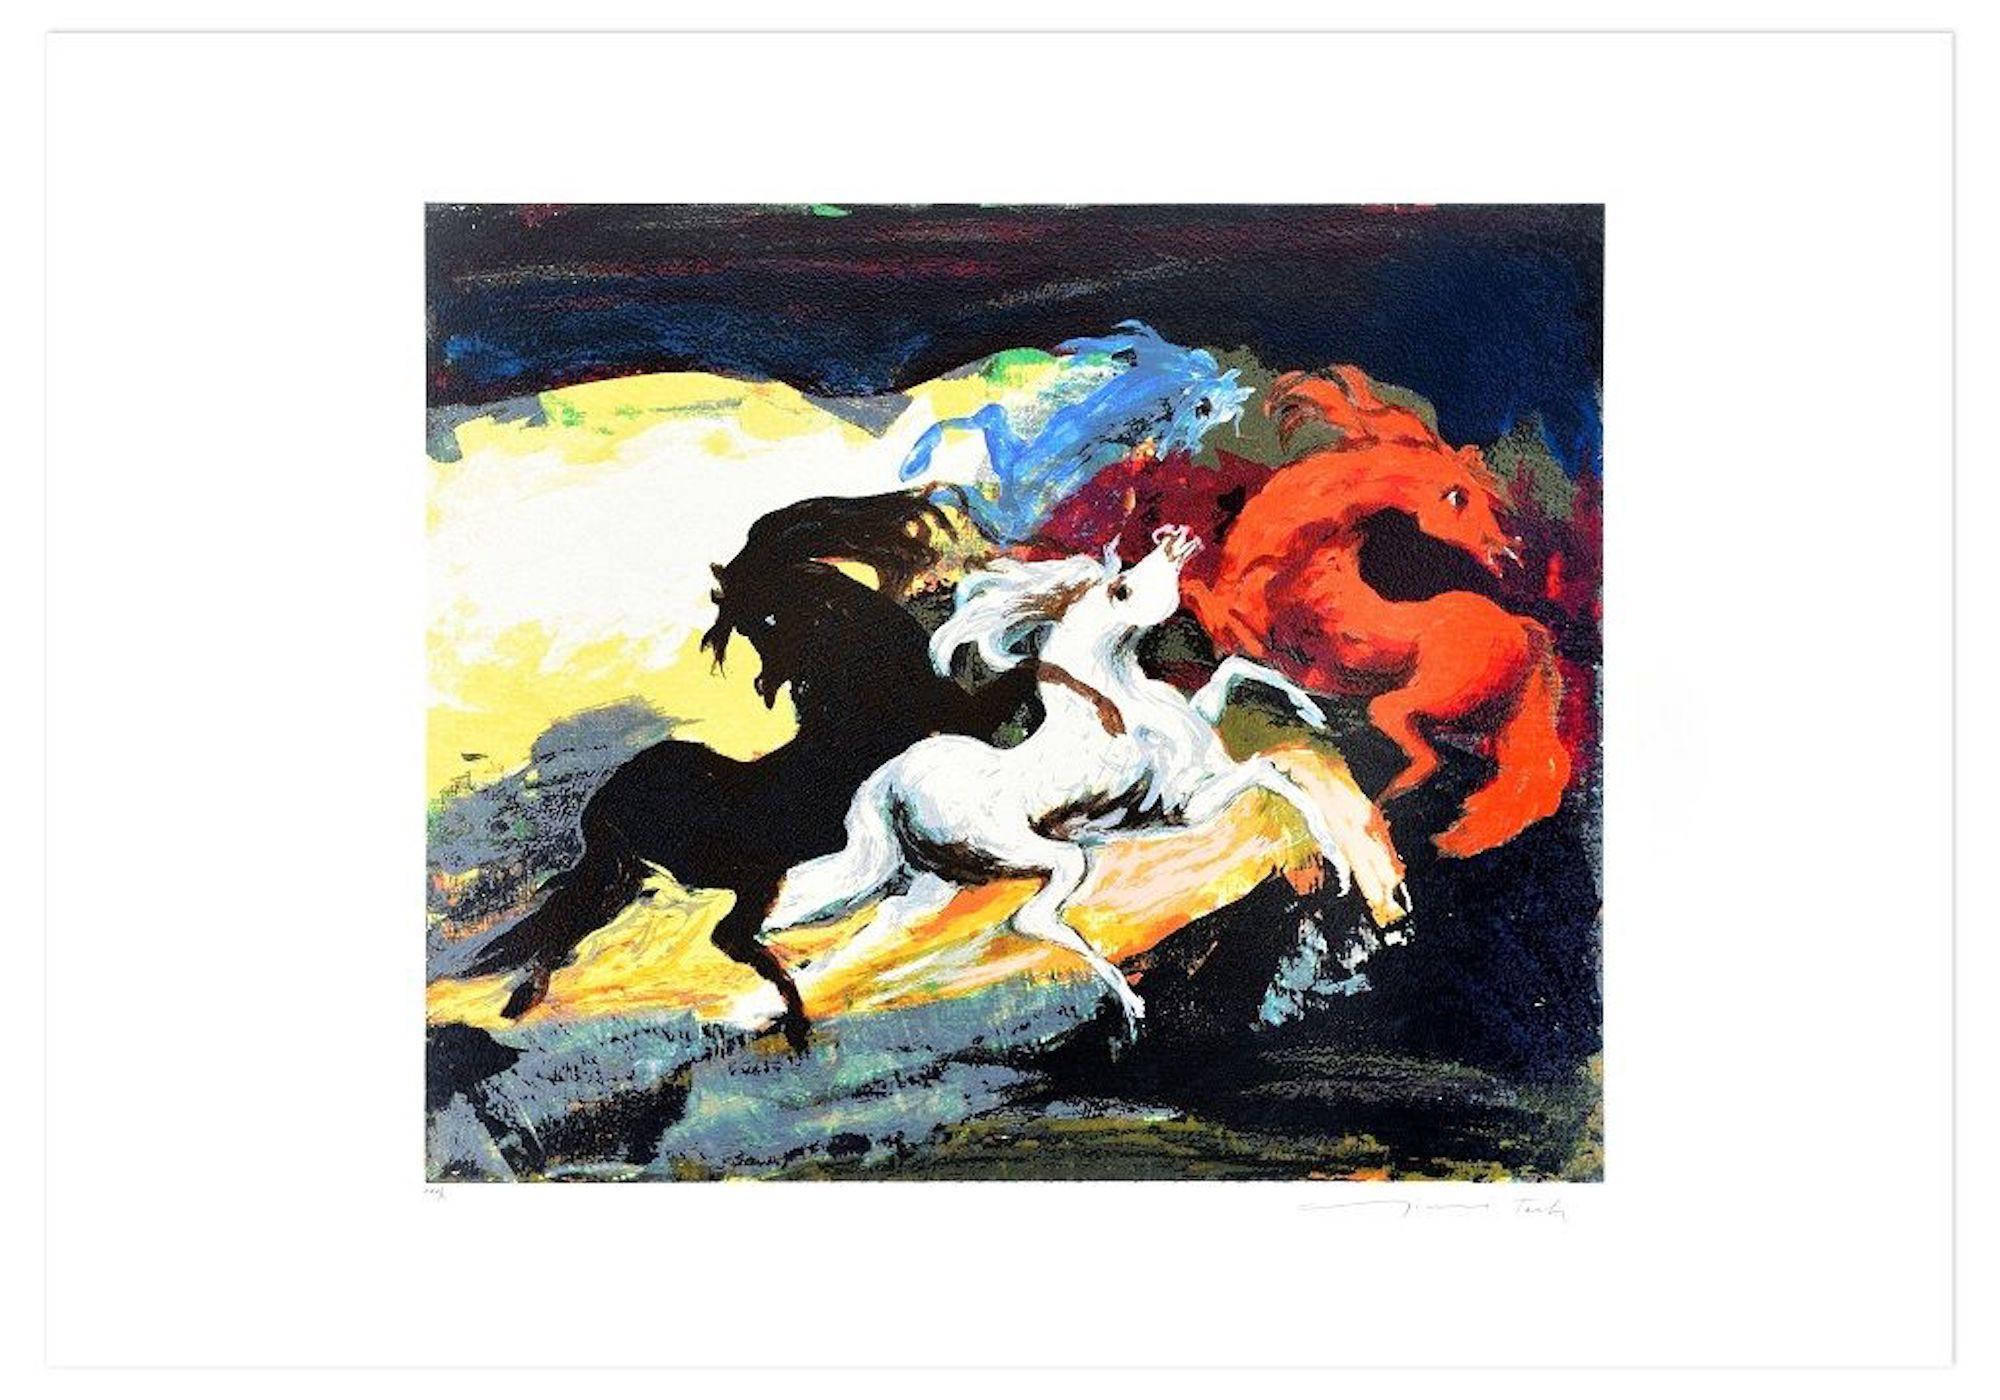 Carousel Of Three Horses - Original Screen Print by Gianni Testa - 1986